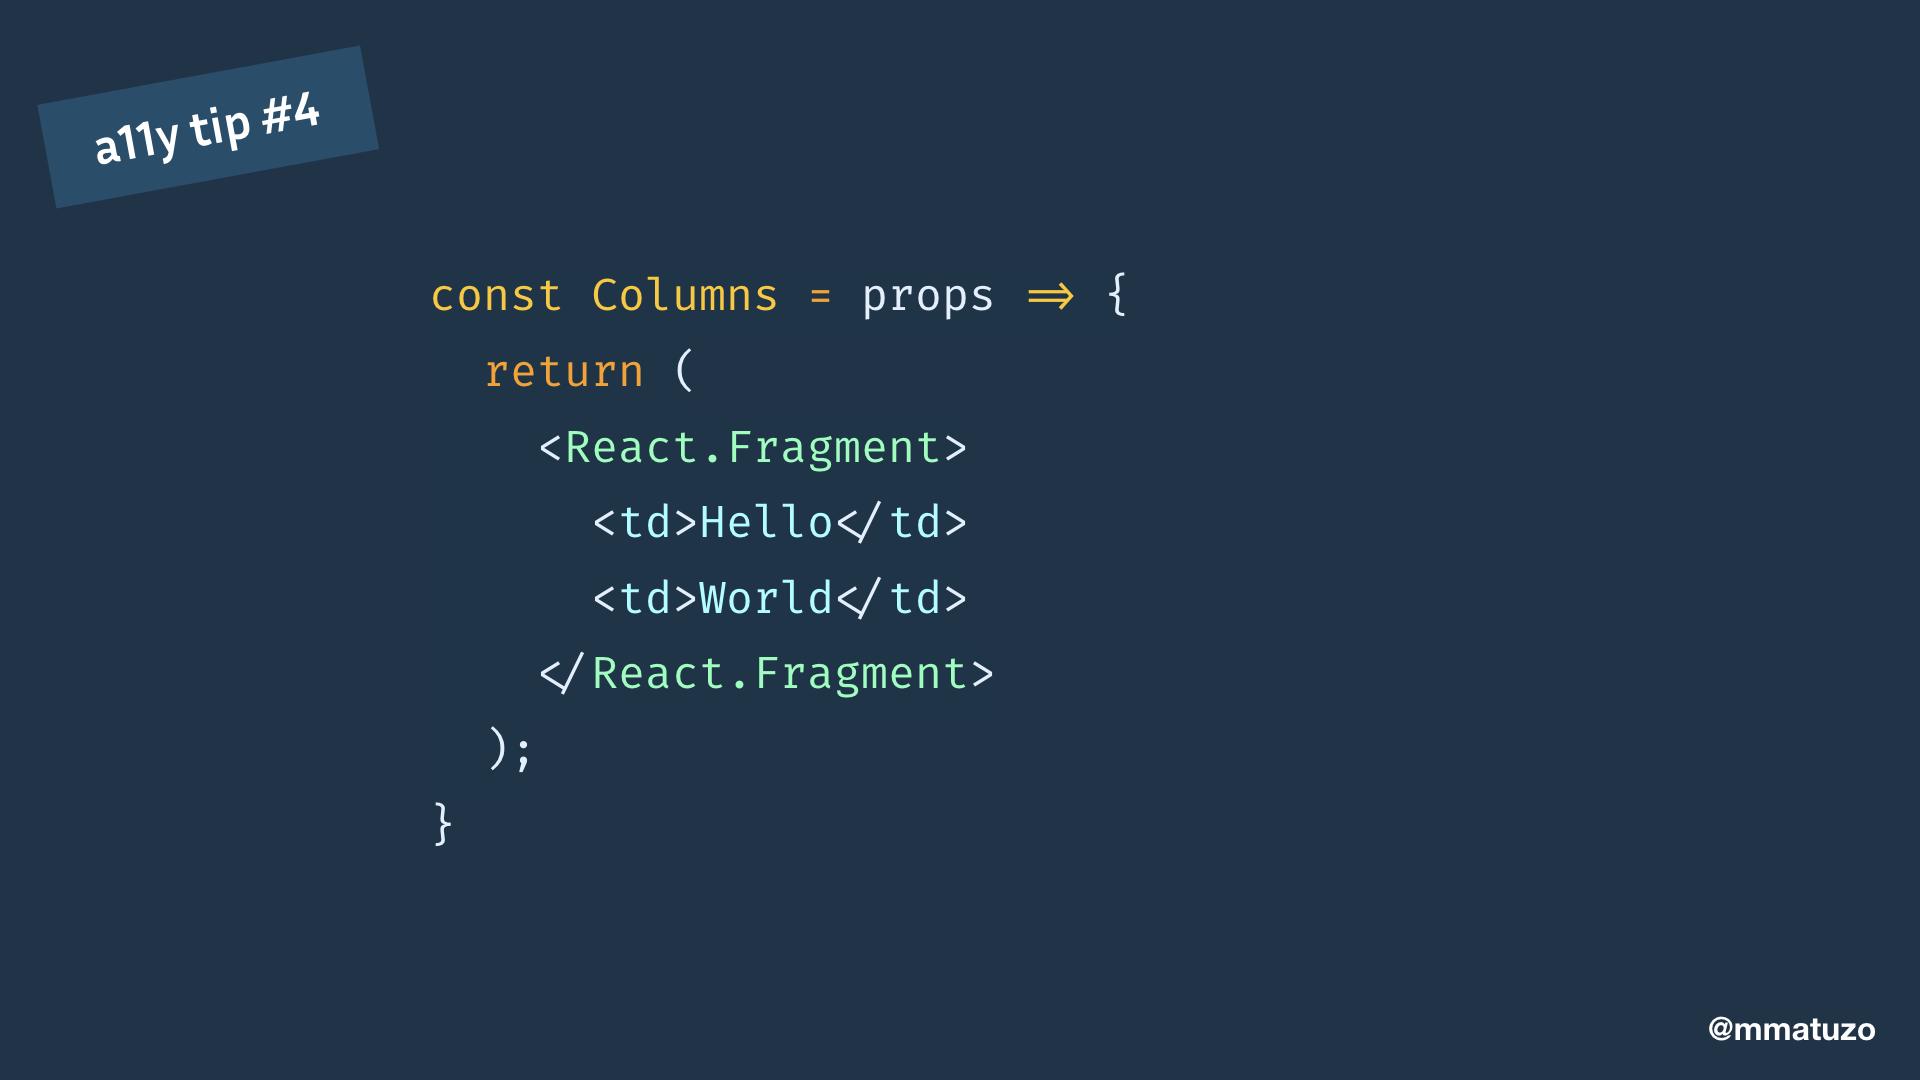 const Columns = props => { return ( <React.Fragment> Hello World </React.Fragment> ); }